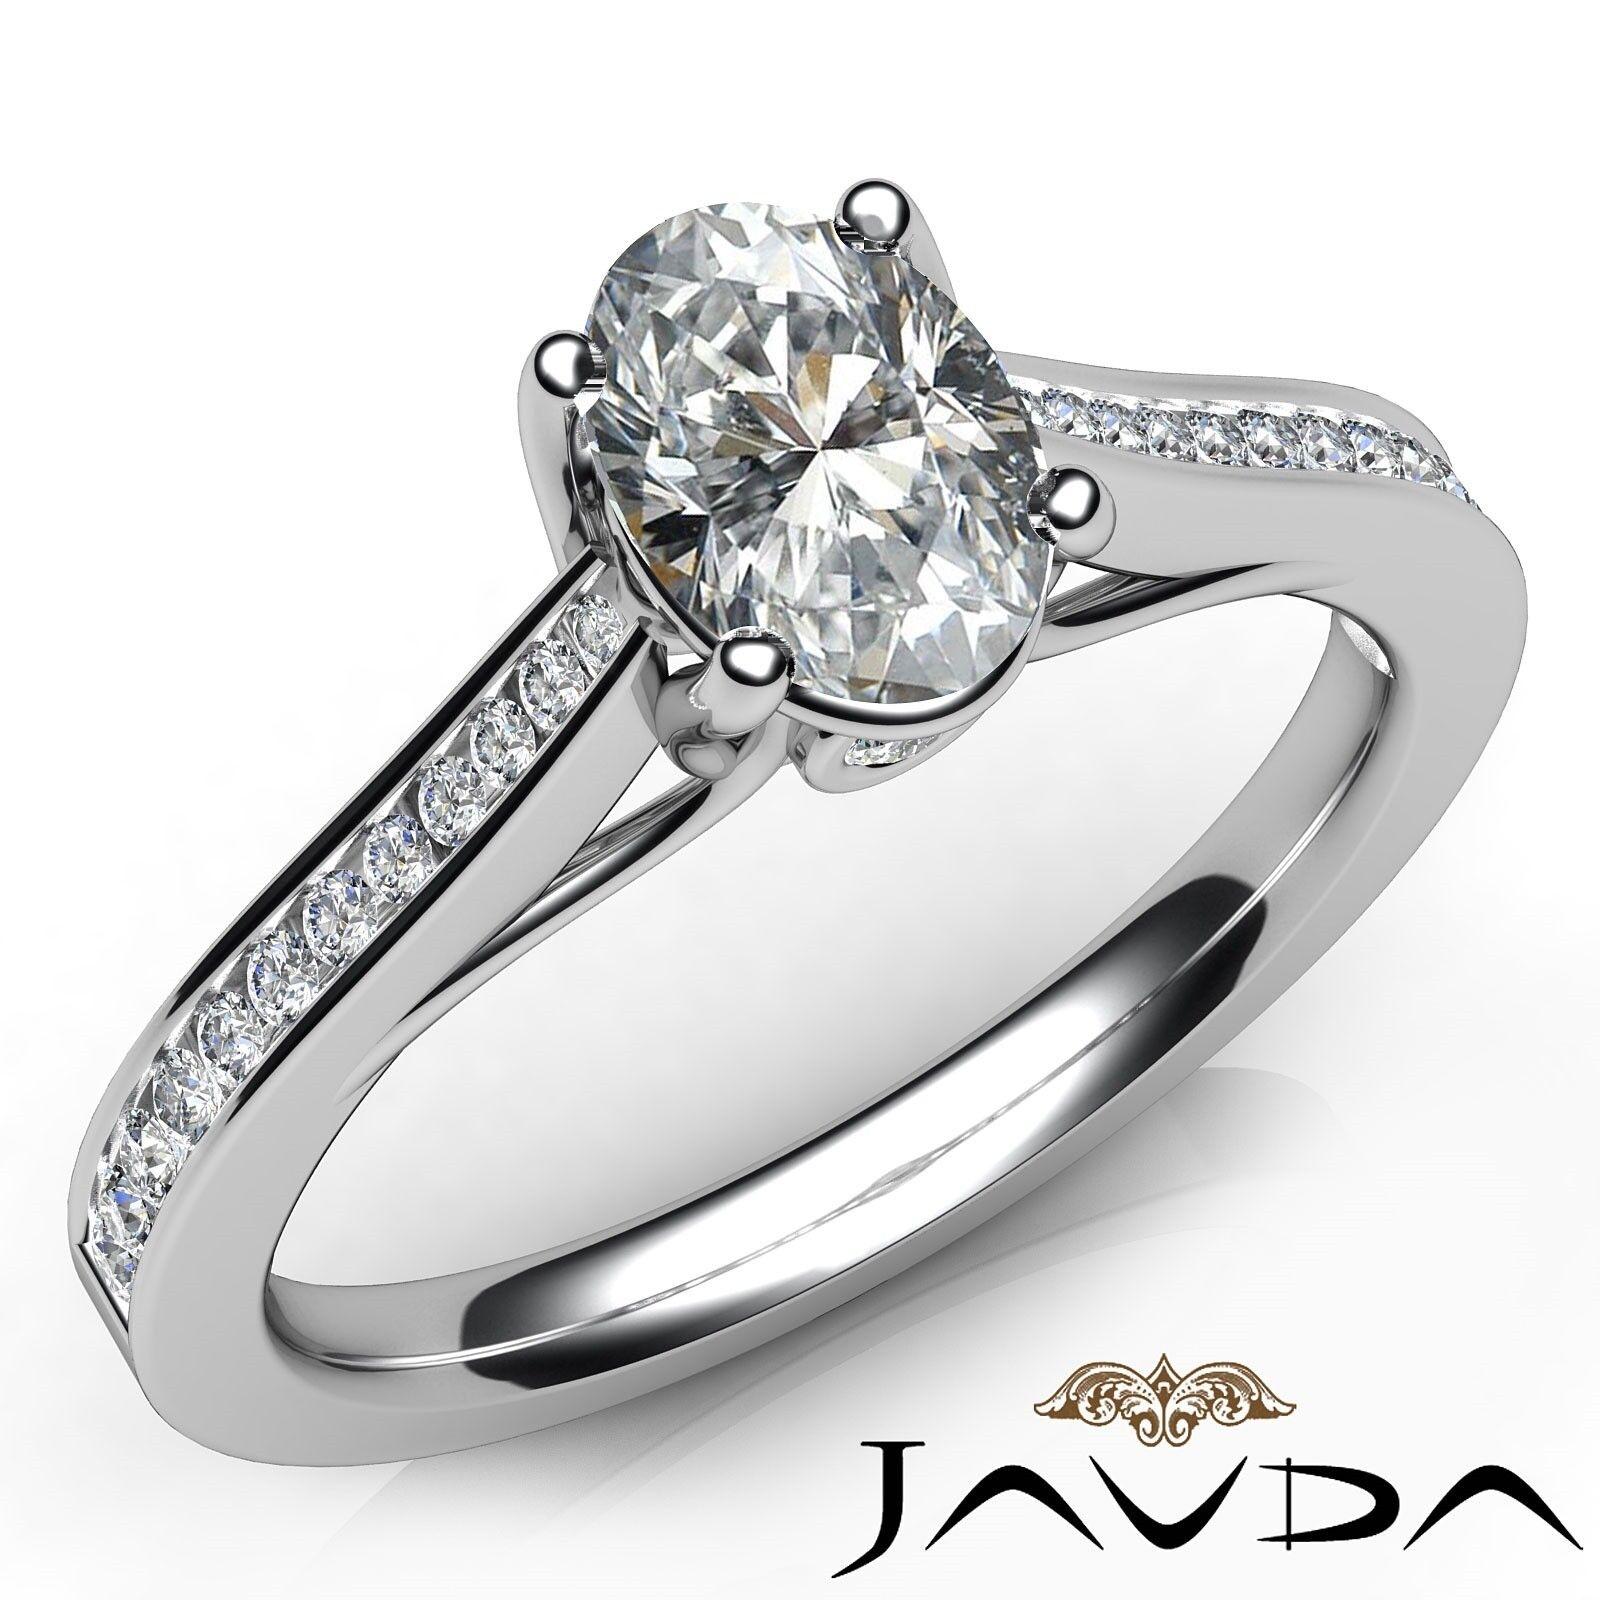 0.82ctw Natural 100% Oval Diamond Engagement Ring GIA J-VVS2 White Gold Women